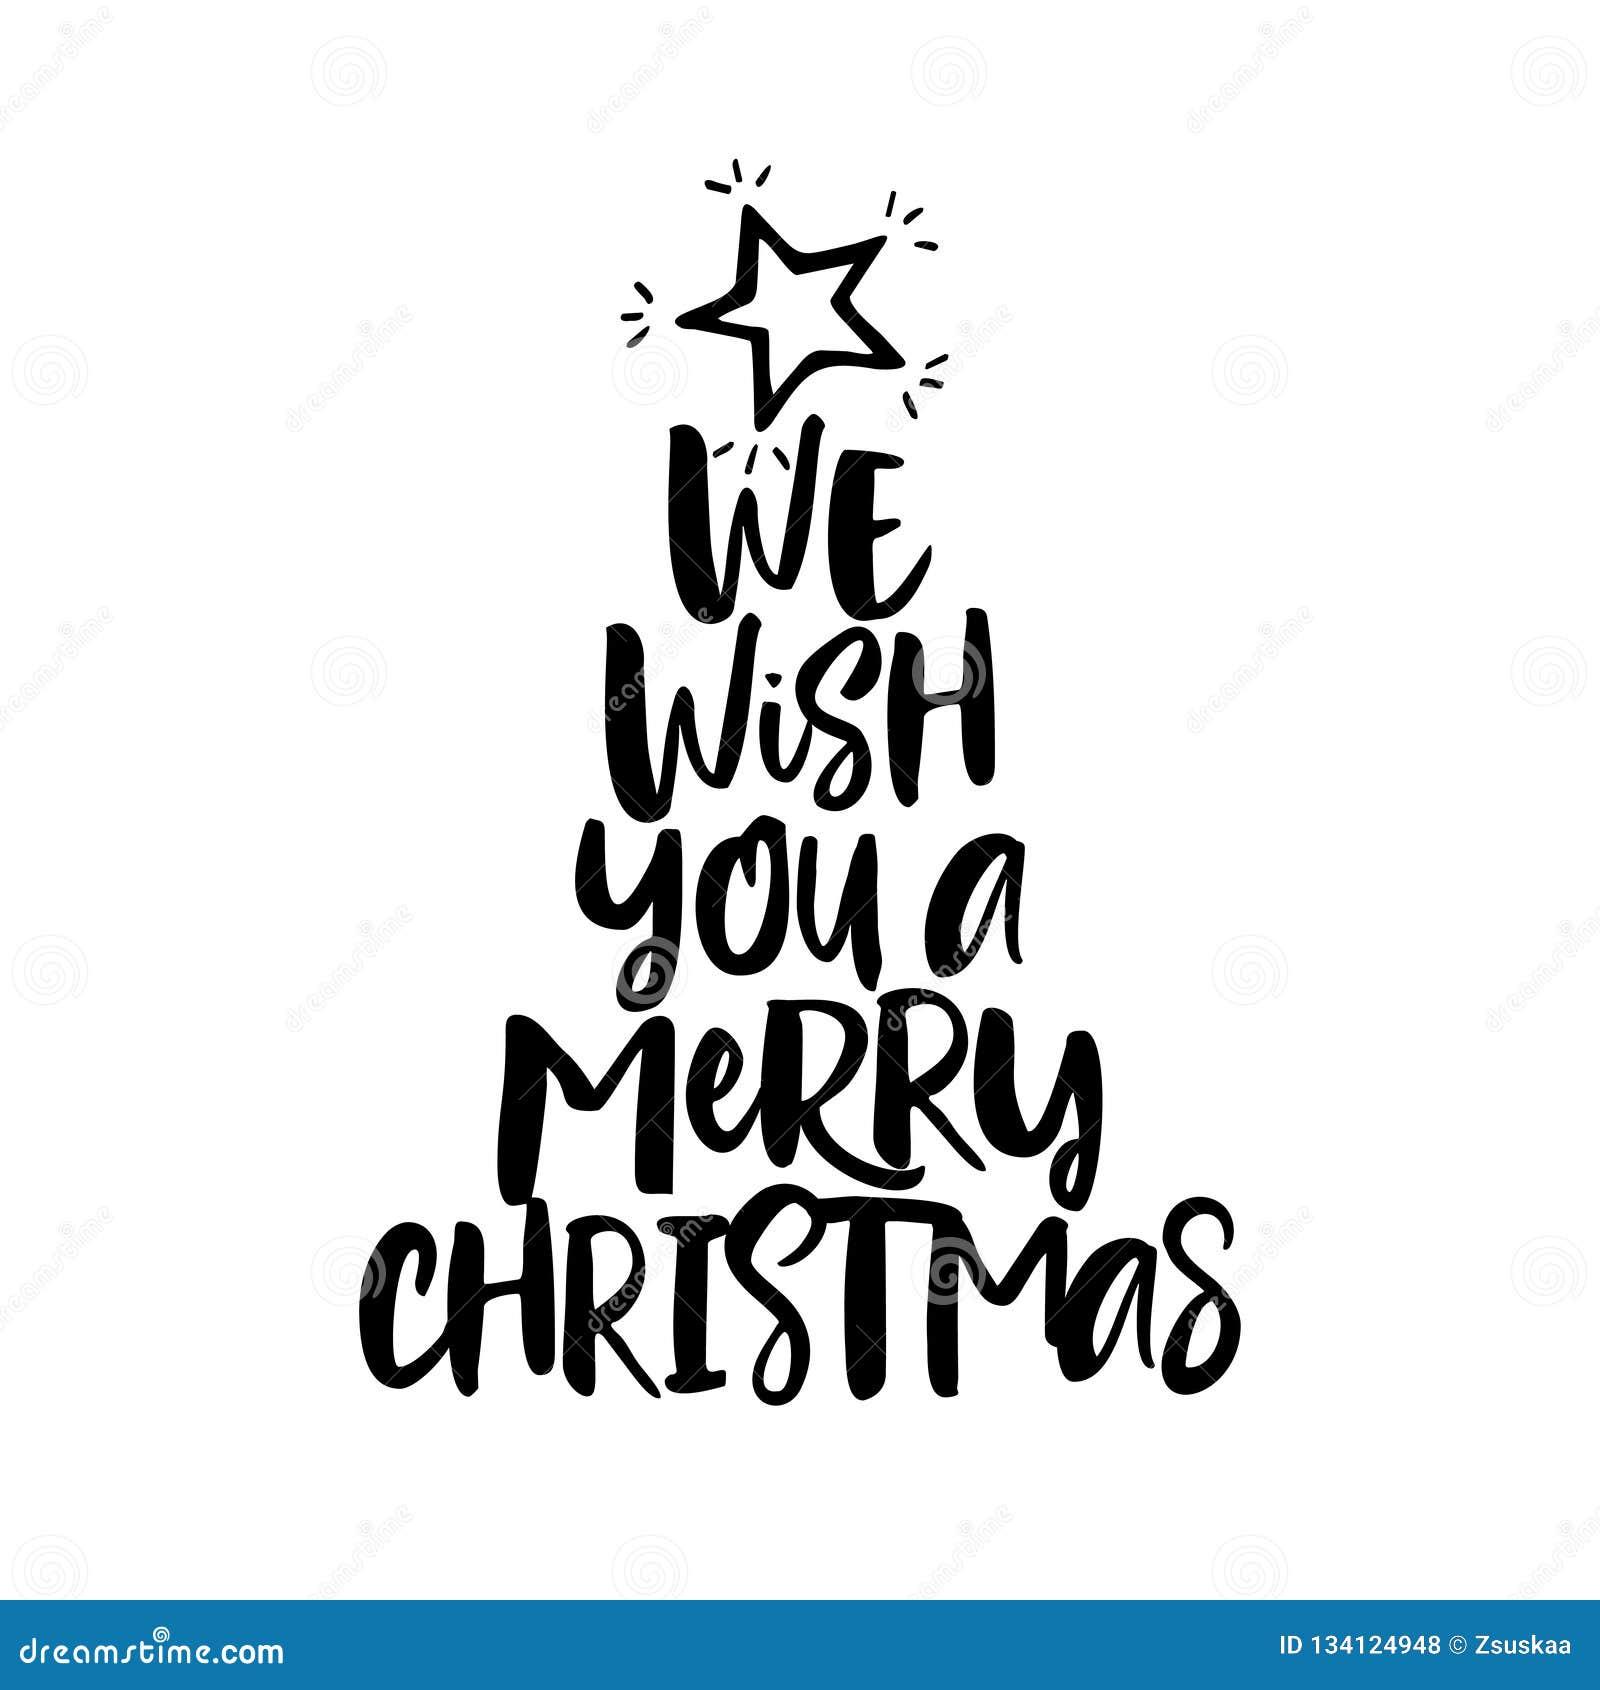 Nous te souhaitons un Joyeux Noël